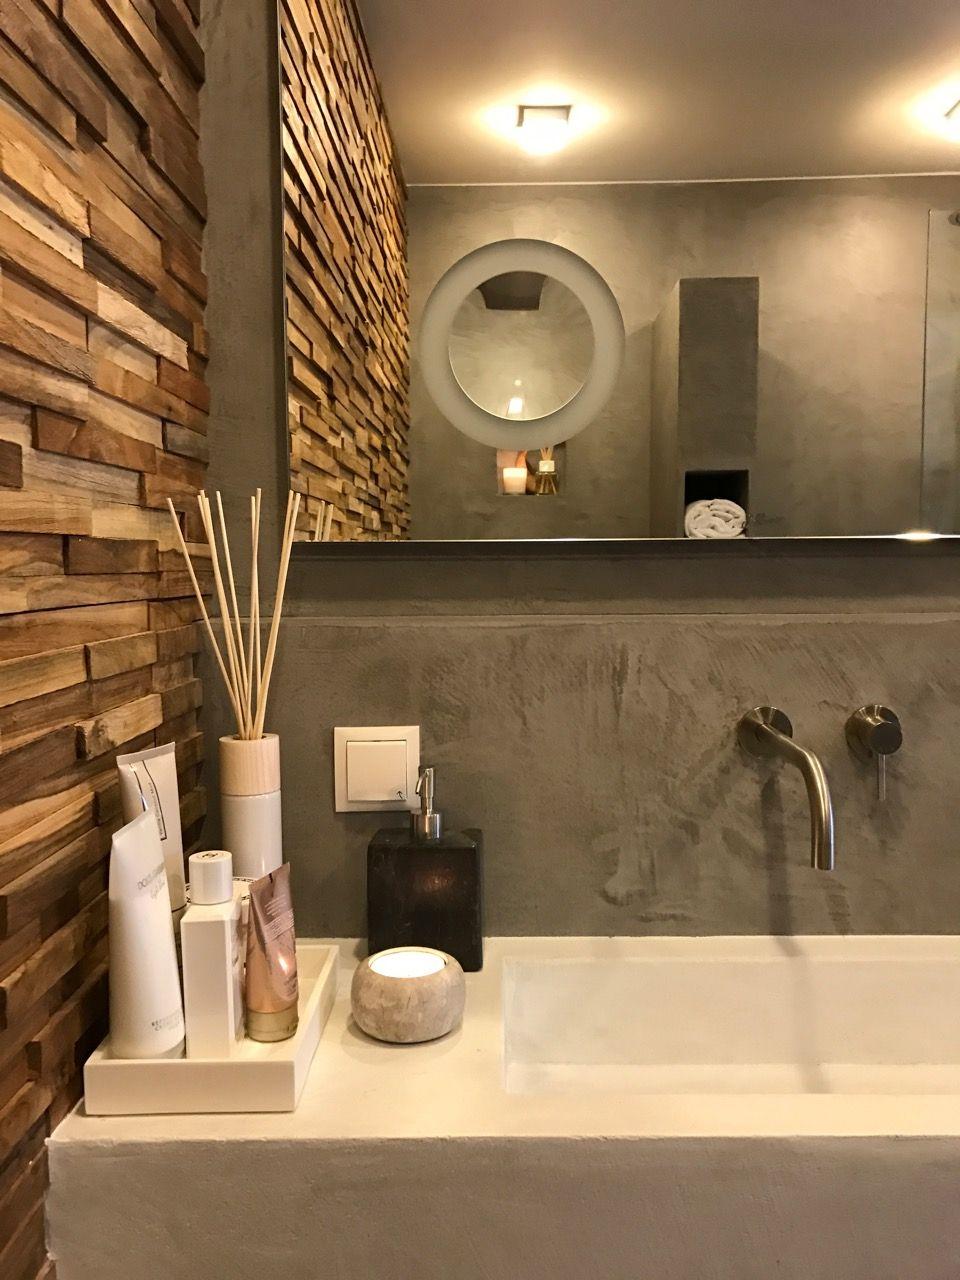 Hotel chique badkamer - Eigen Huis & Tuin | Badkamer kaj | Pinterest ...